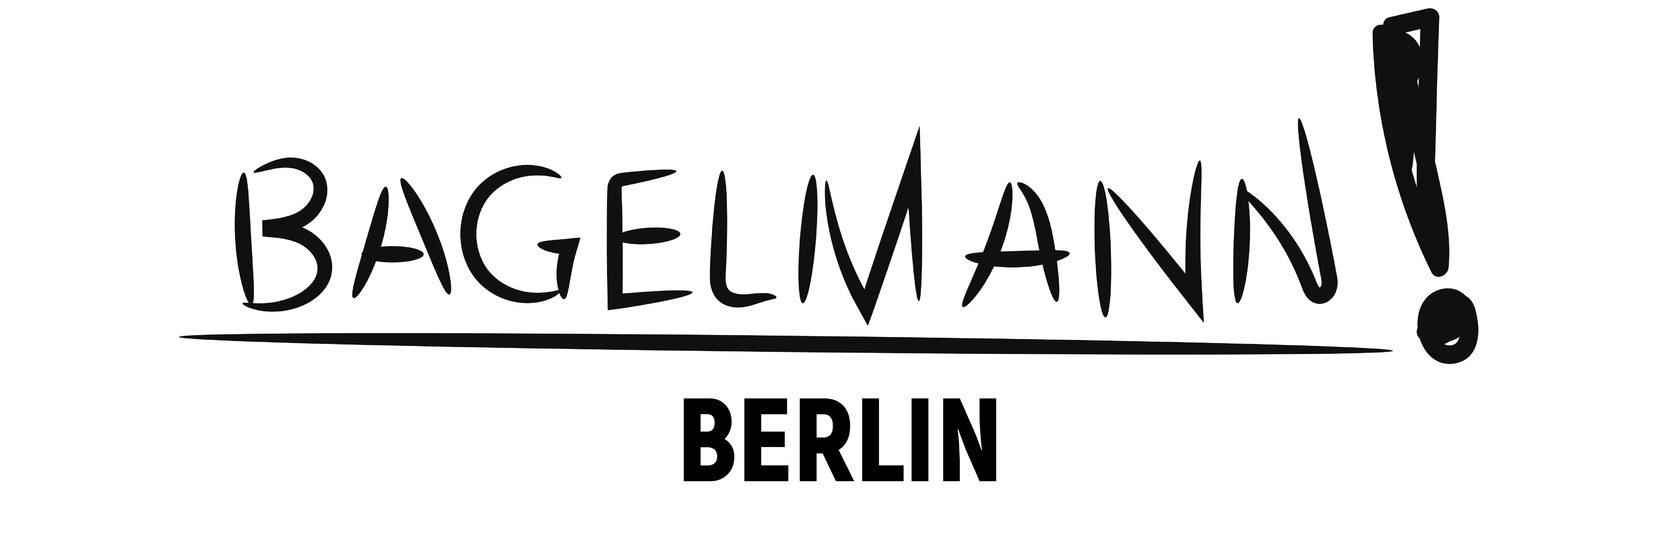 Bagelmann Cafe. Berlin.